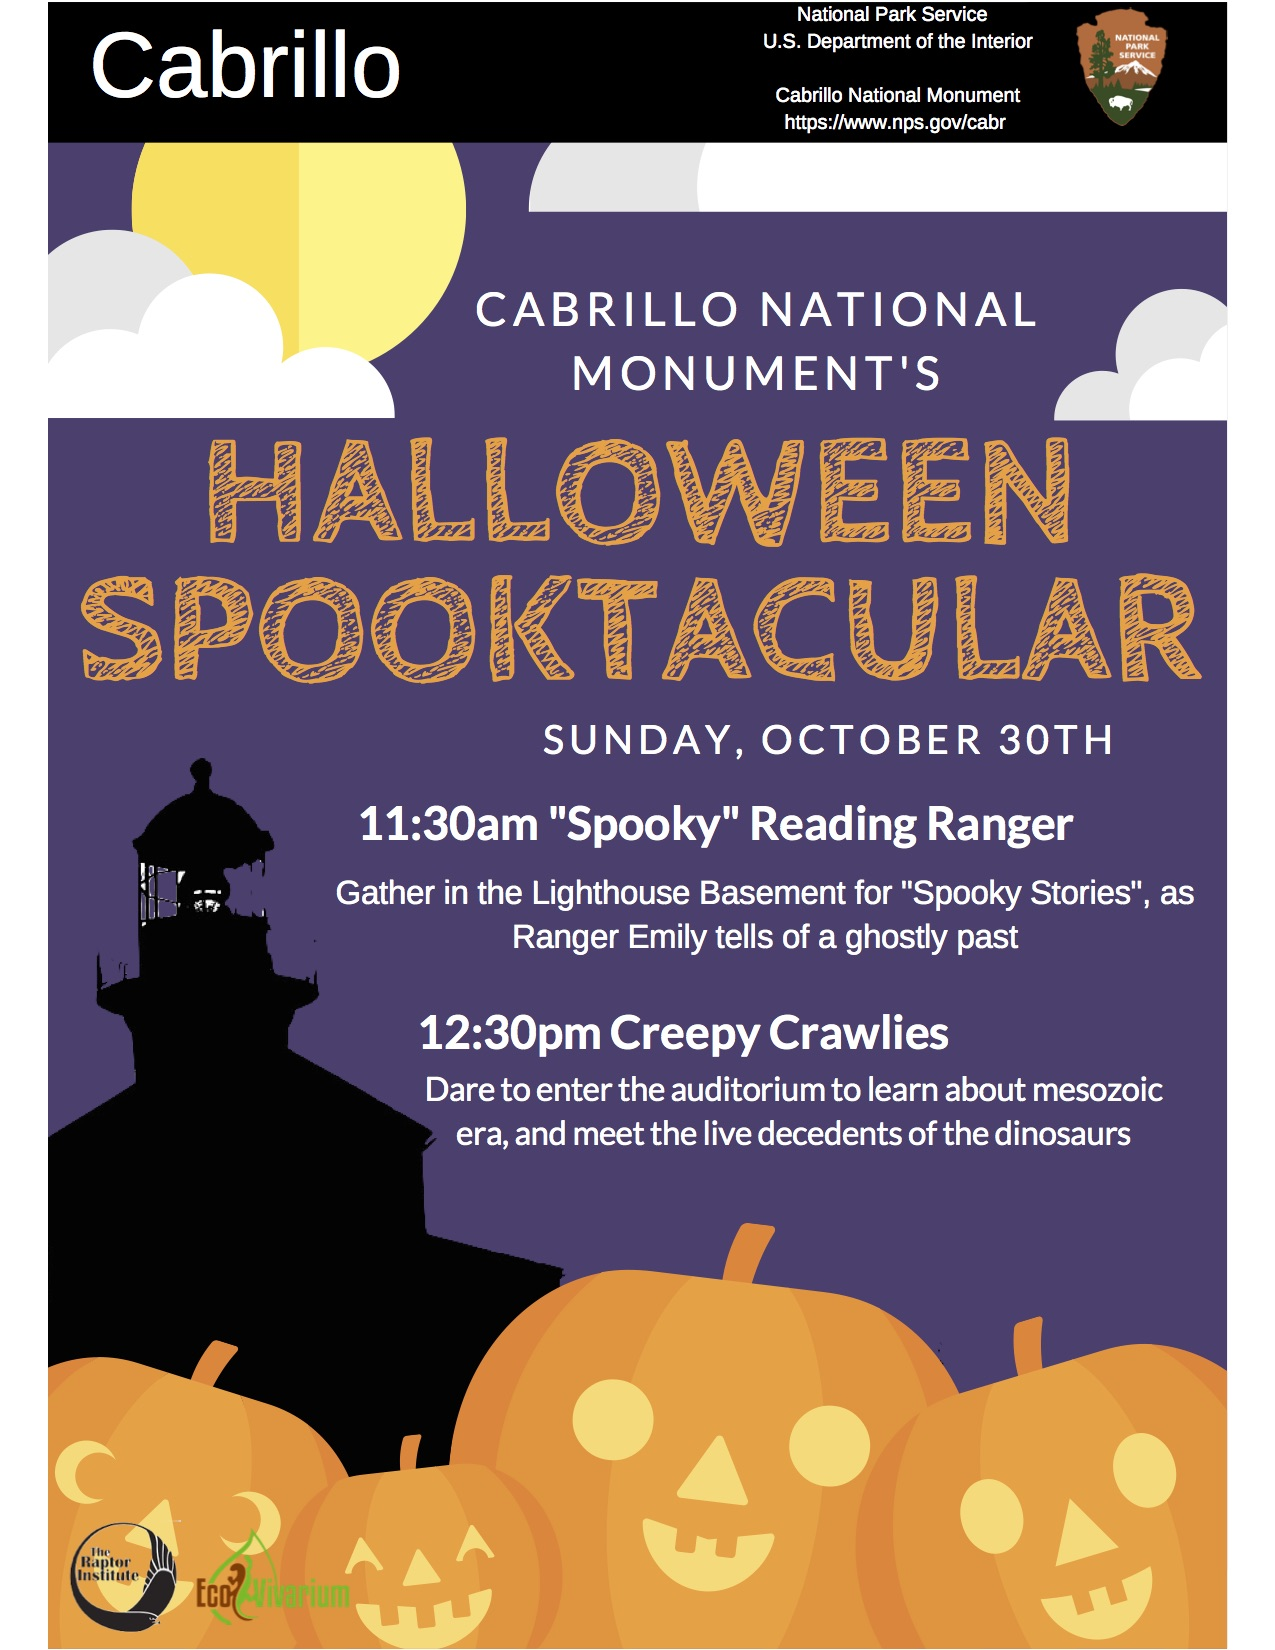 Halloween Spooktacular At Cabrillo Nm Nps100sca